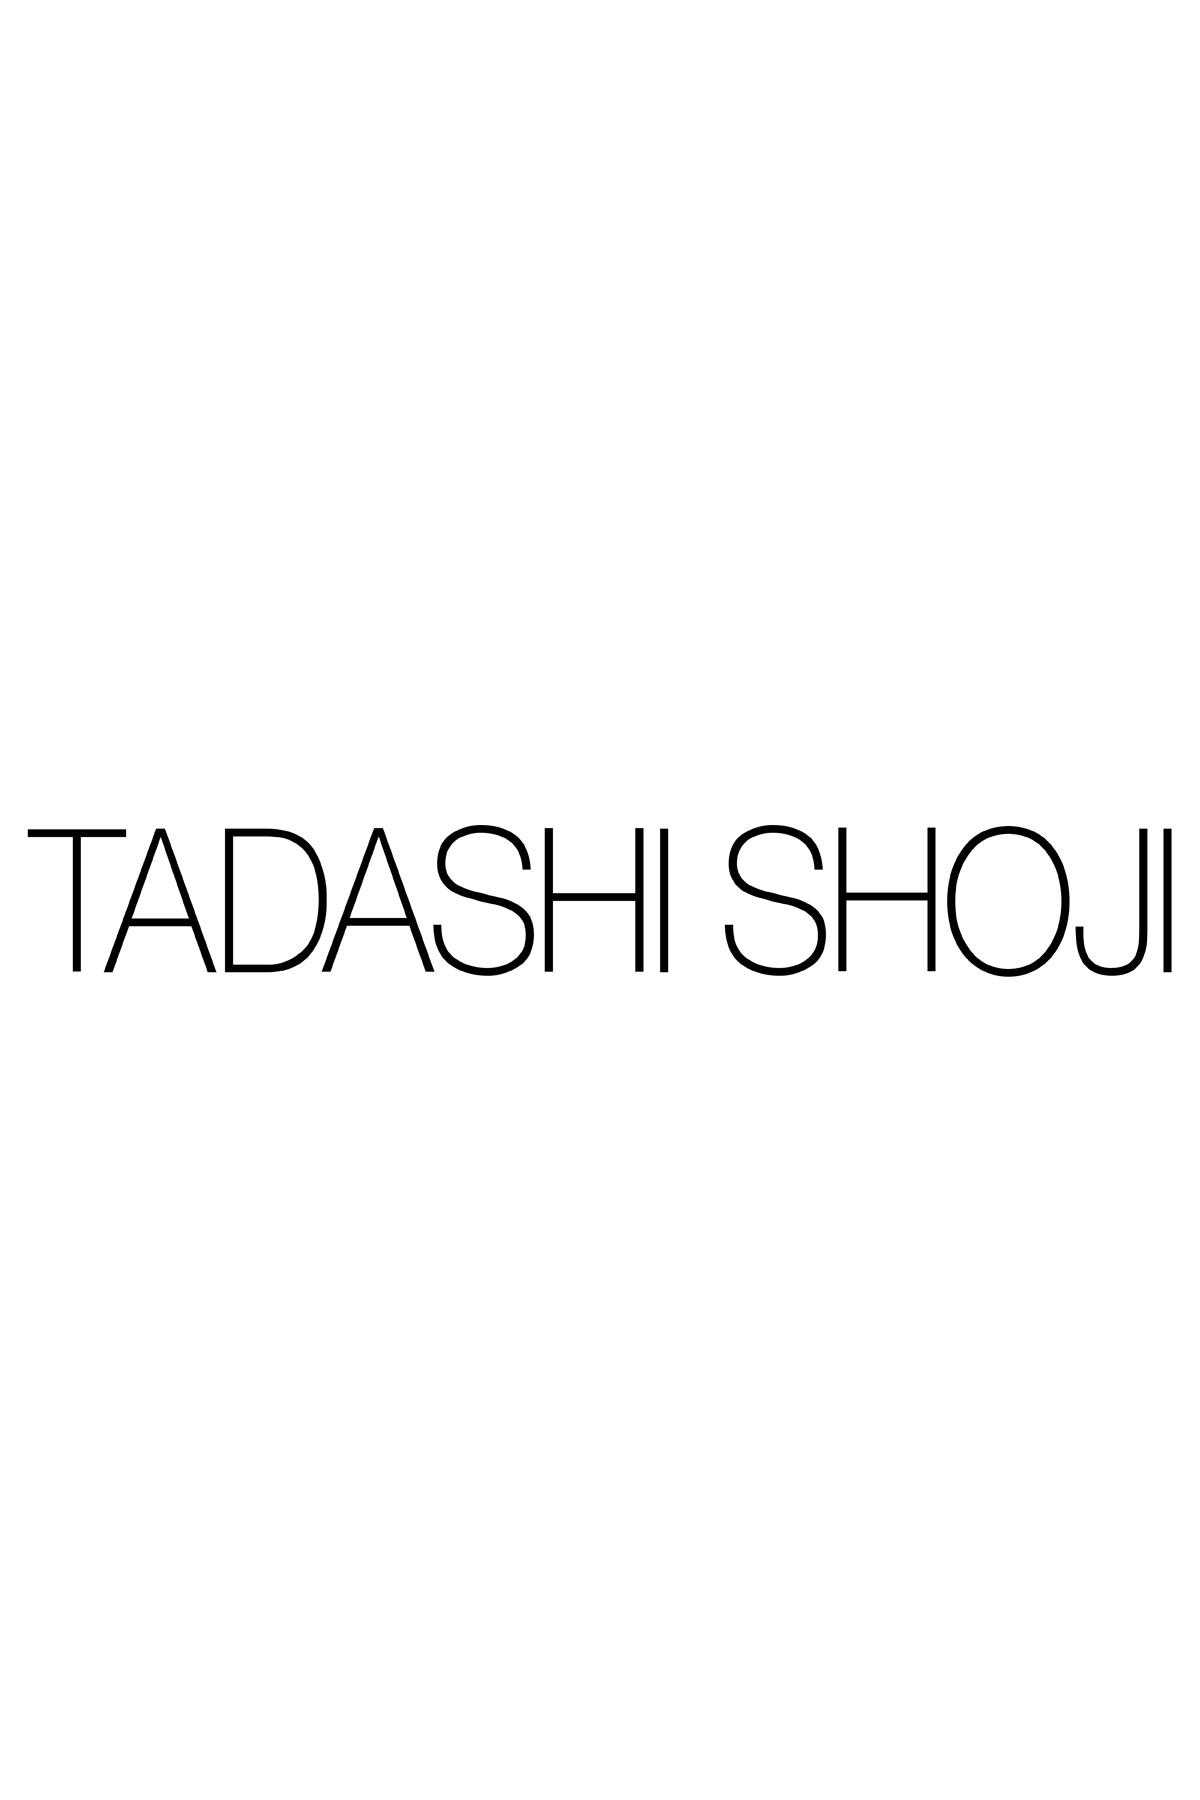 Tadashi Shoji - Corded Embroidery on Tulle 3/4 Sleeve Dress - Detail